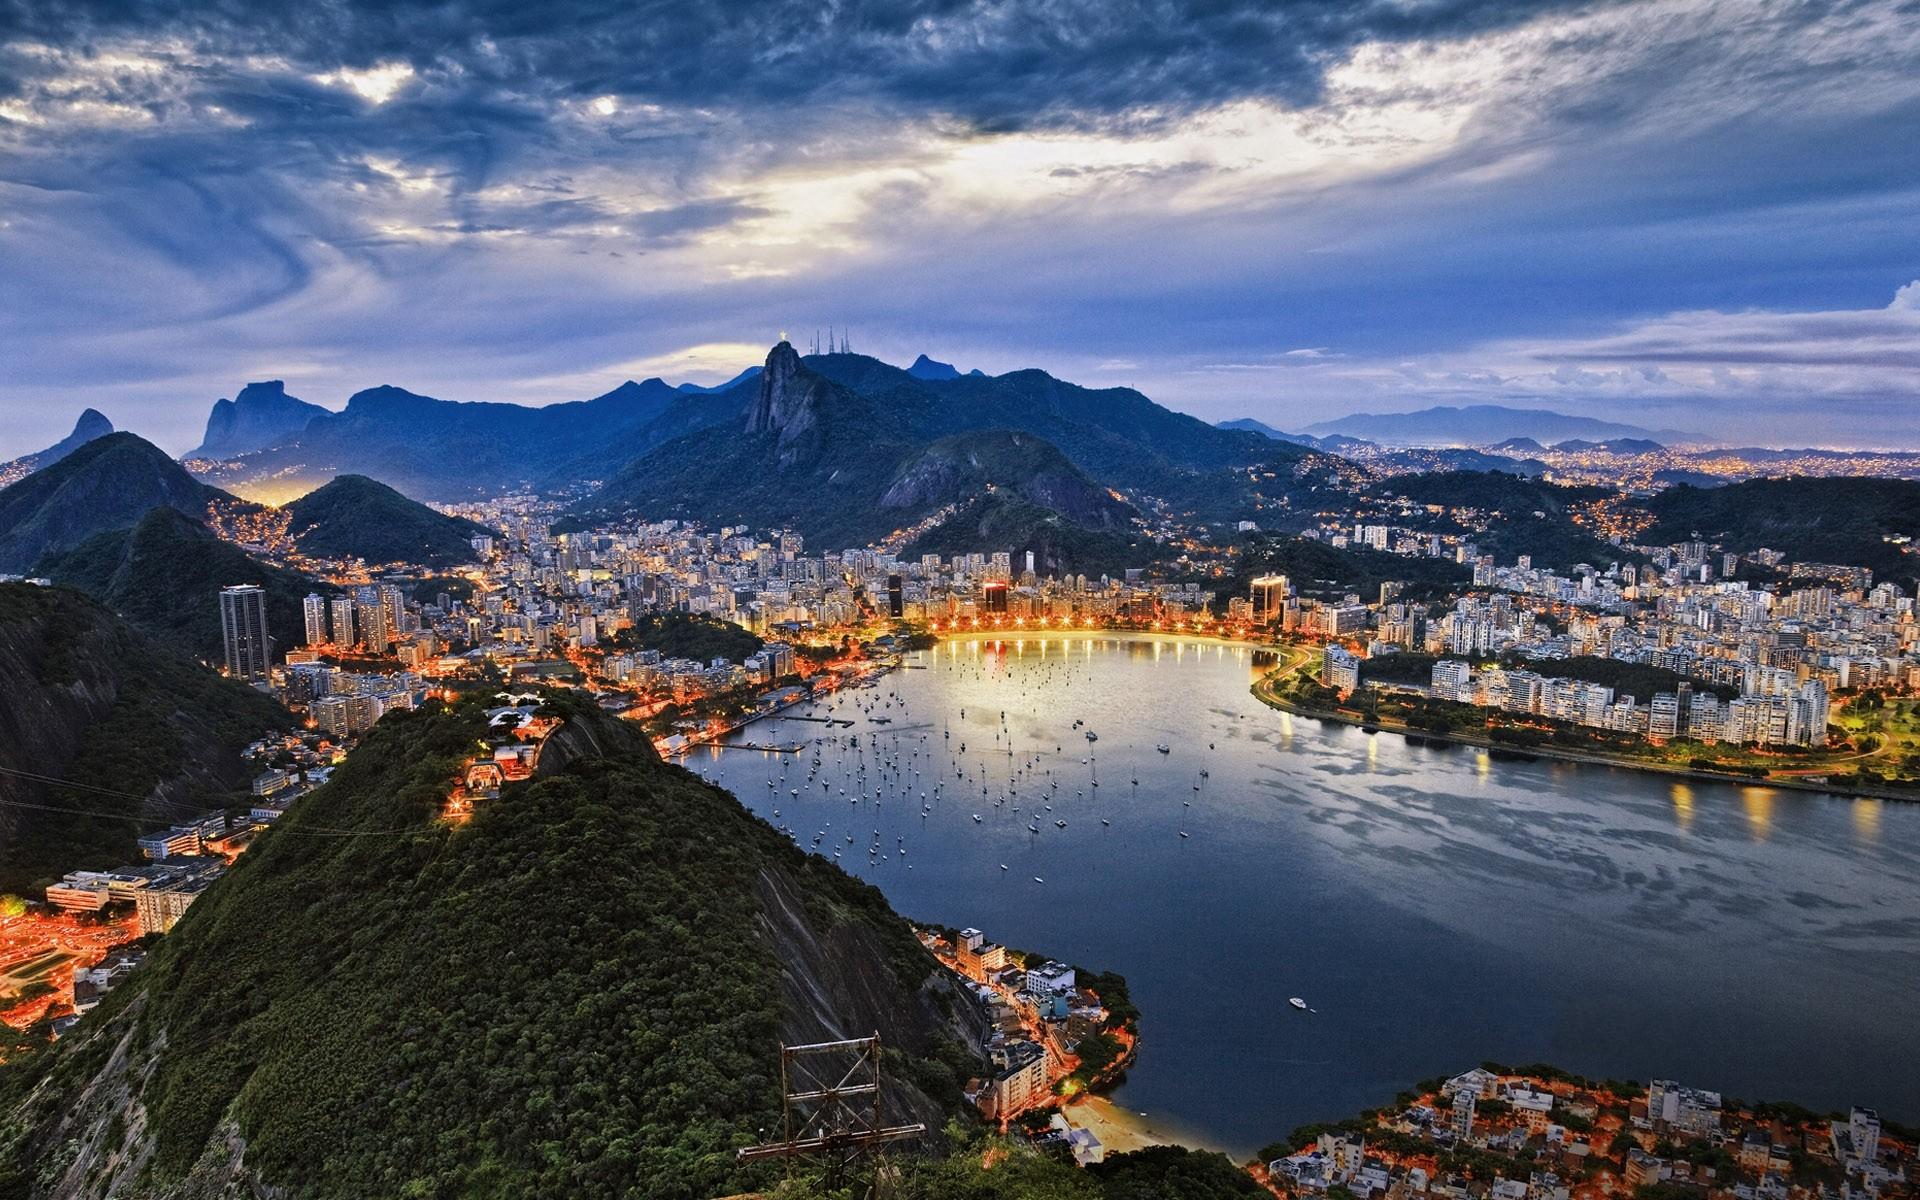 42 Rio De Janeiro Brazil Wallpaper On Wallpapersafari